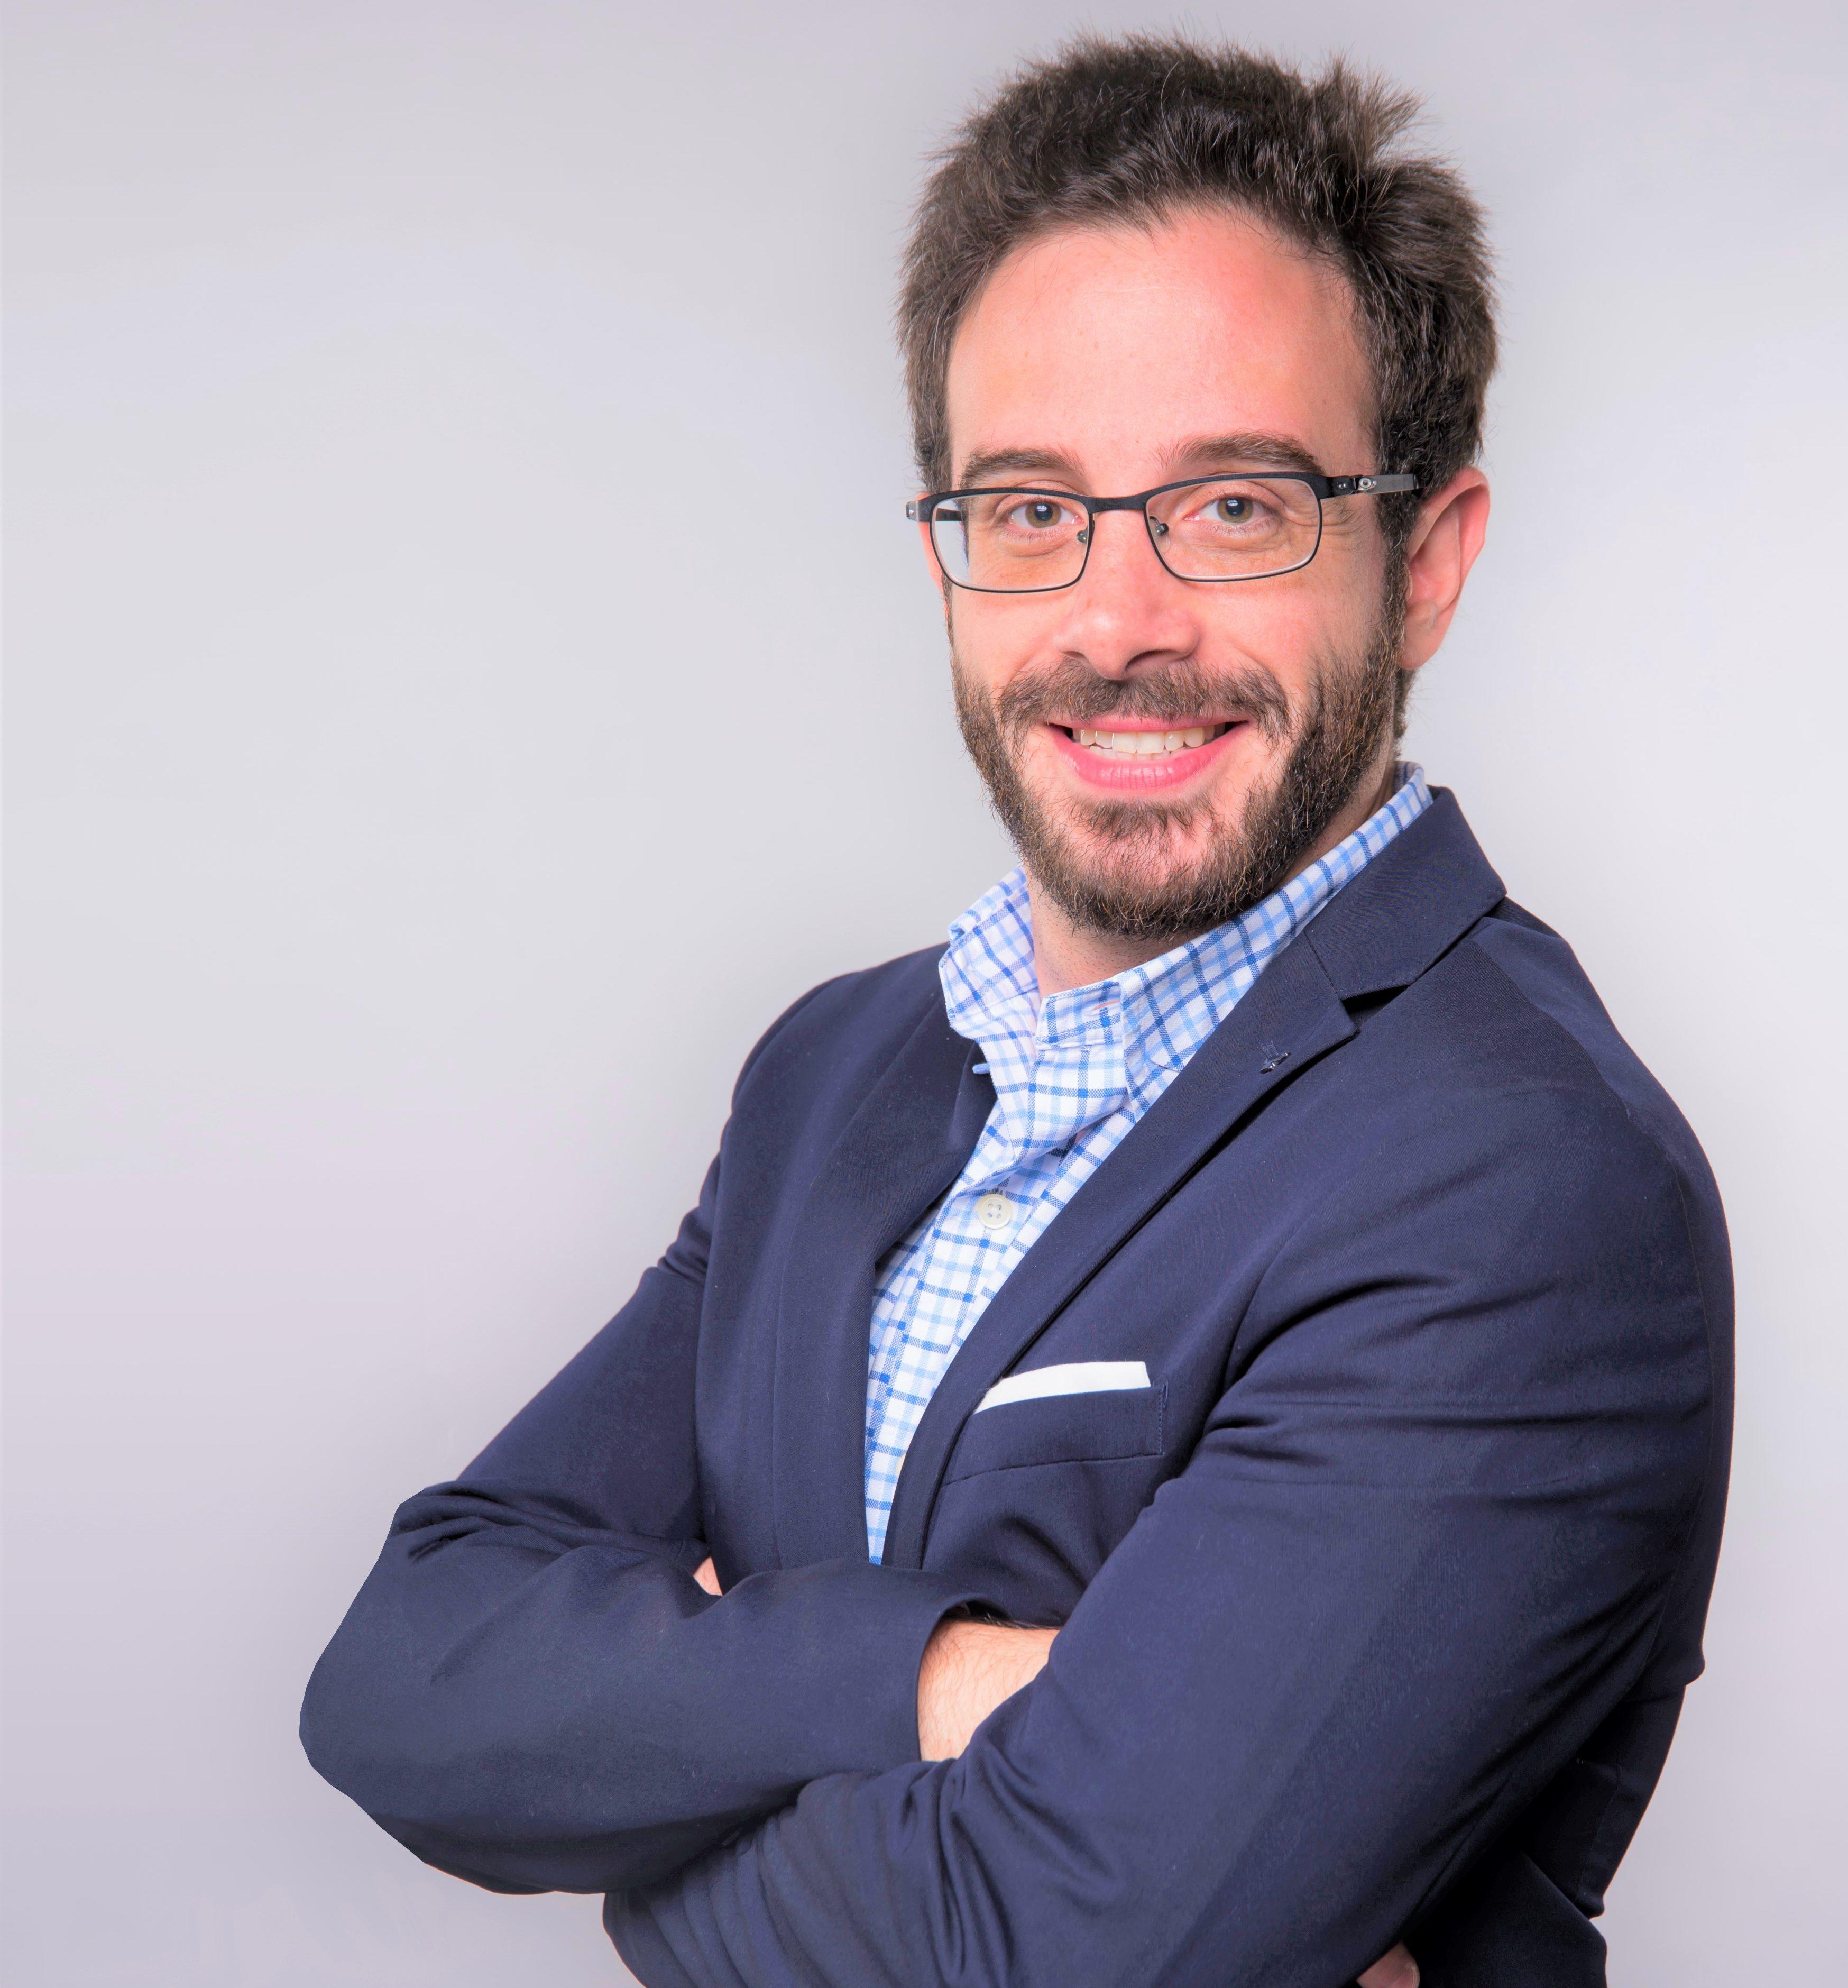 Elias Bou-Harb